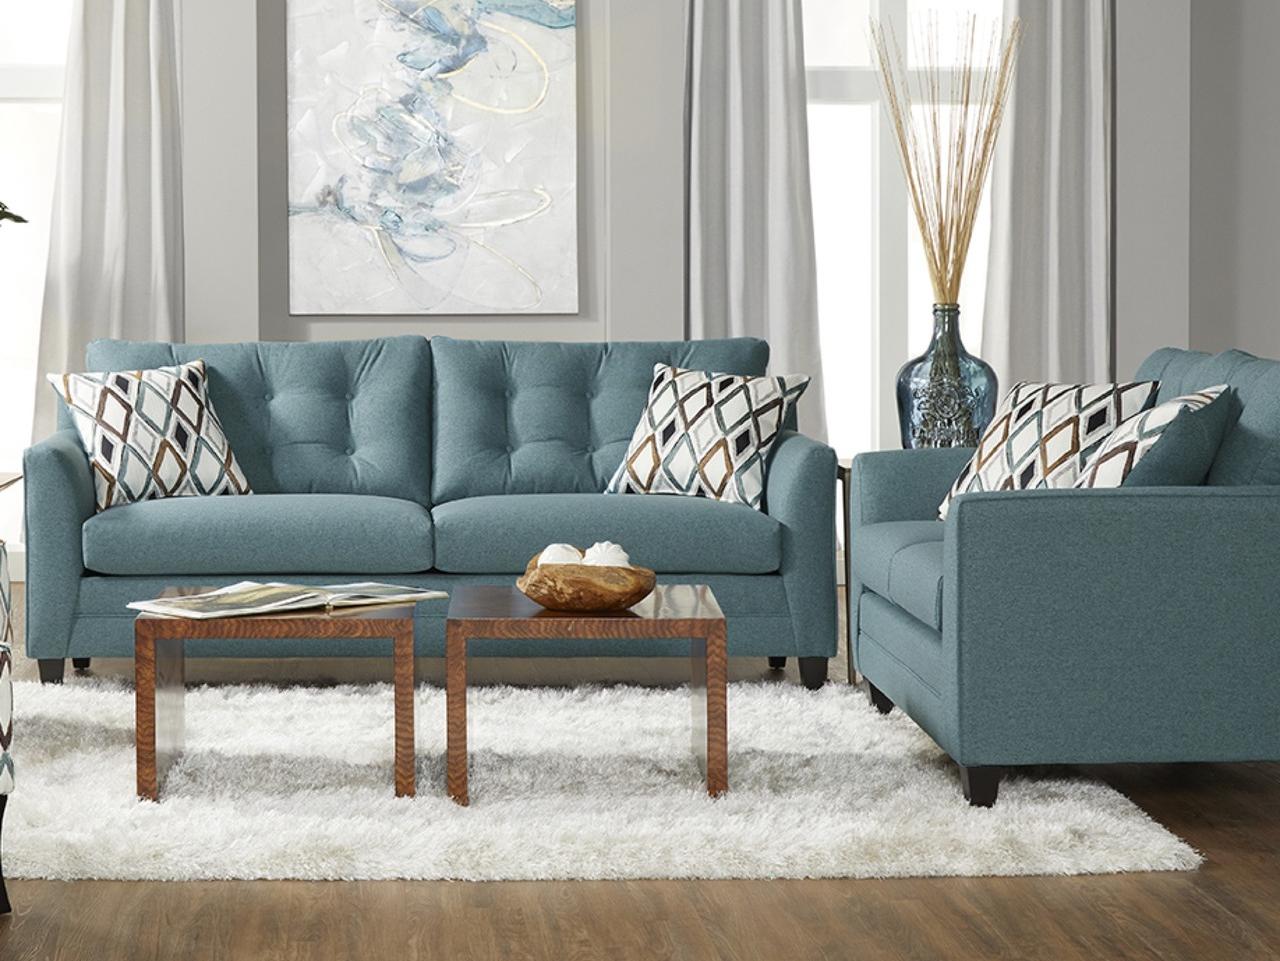 Serta 11900 Sofa and Love Seat Wexler Splash